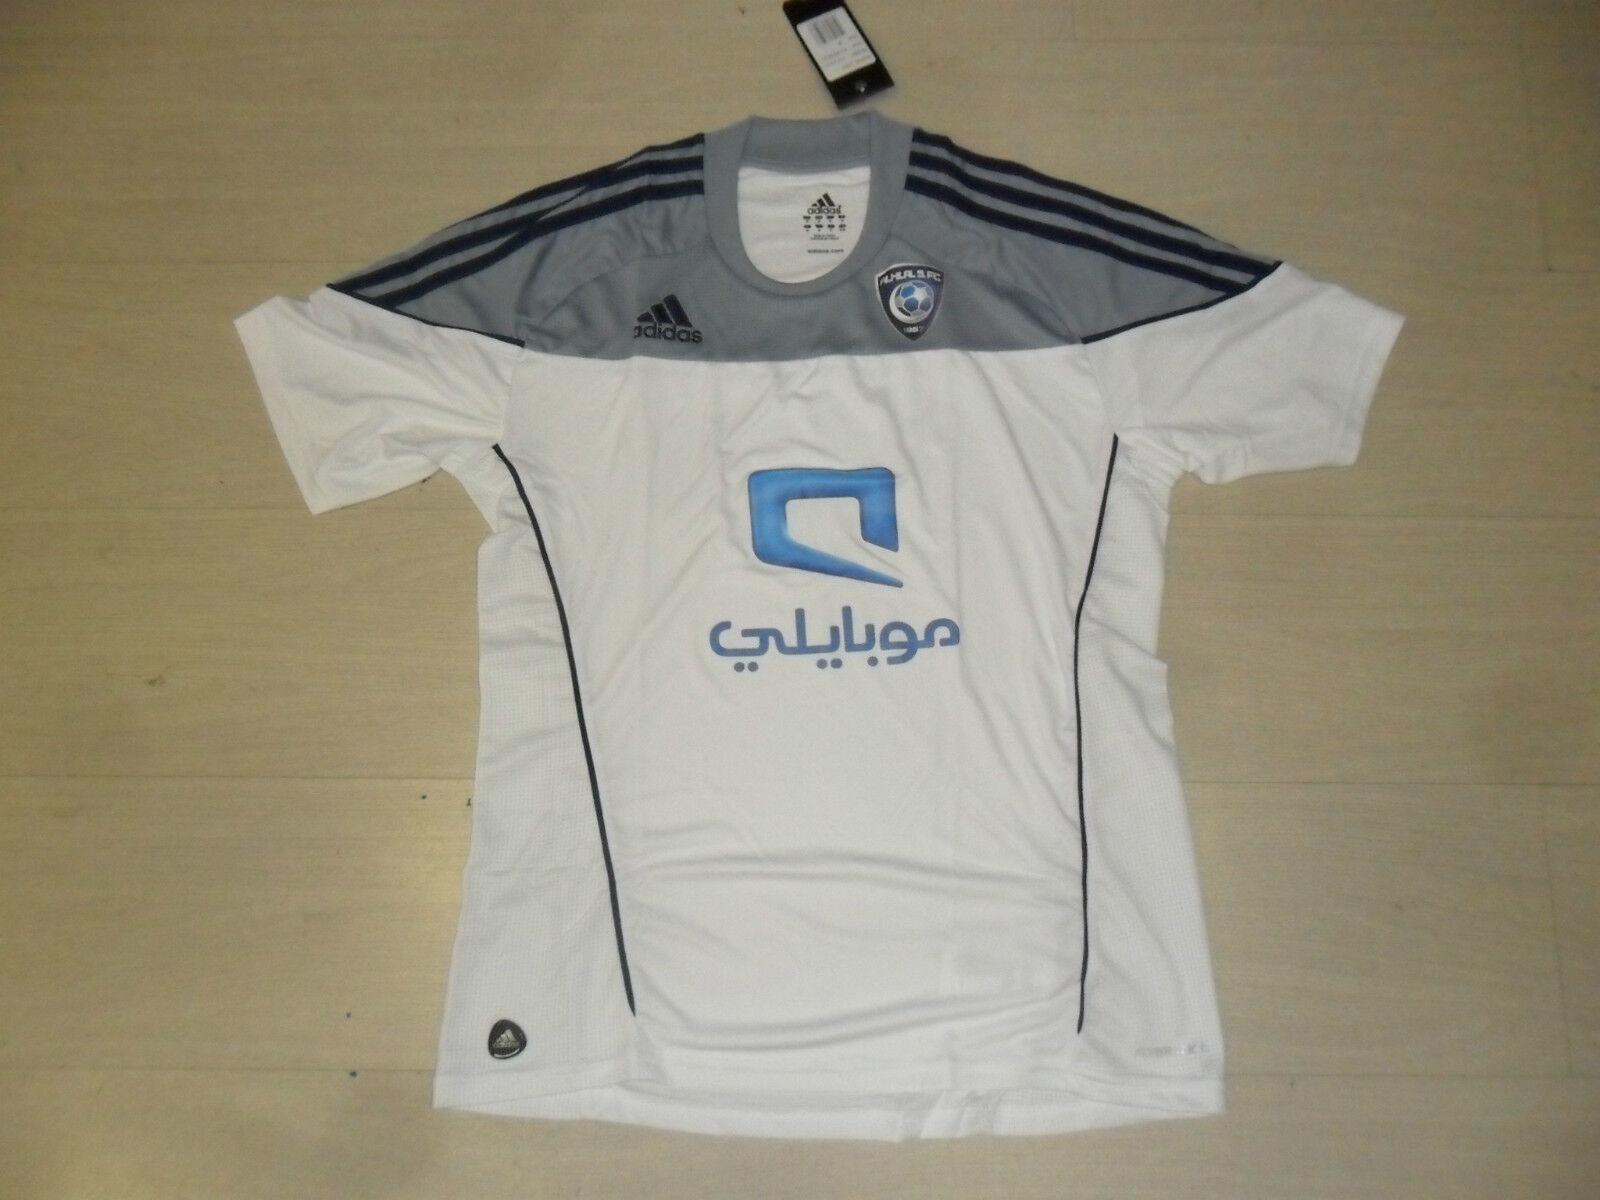 1193 afmeting M Adidas to Hilal T-Shirt Away Shirt Trikot